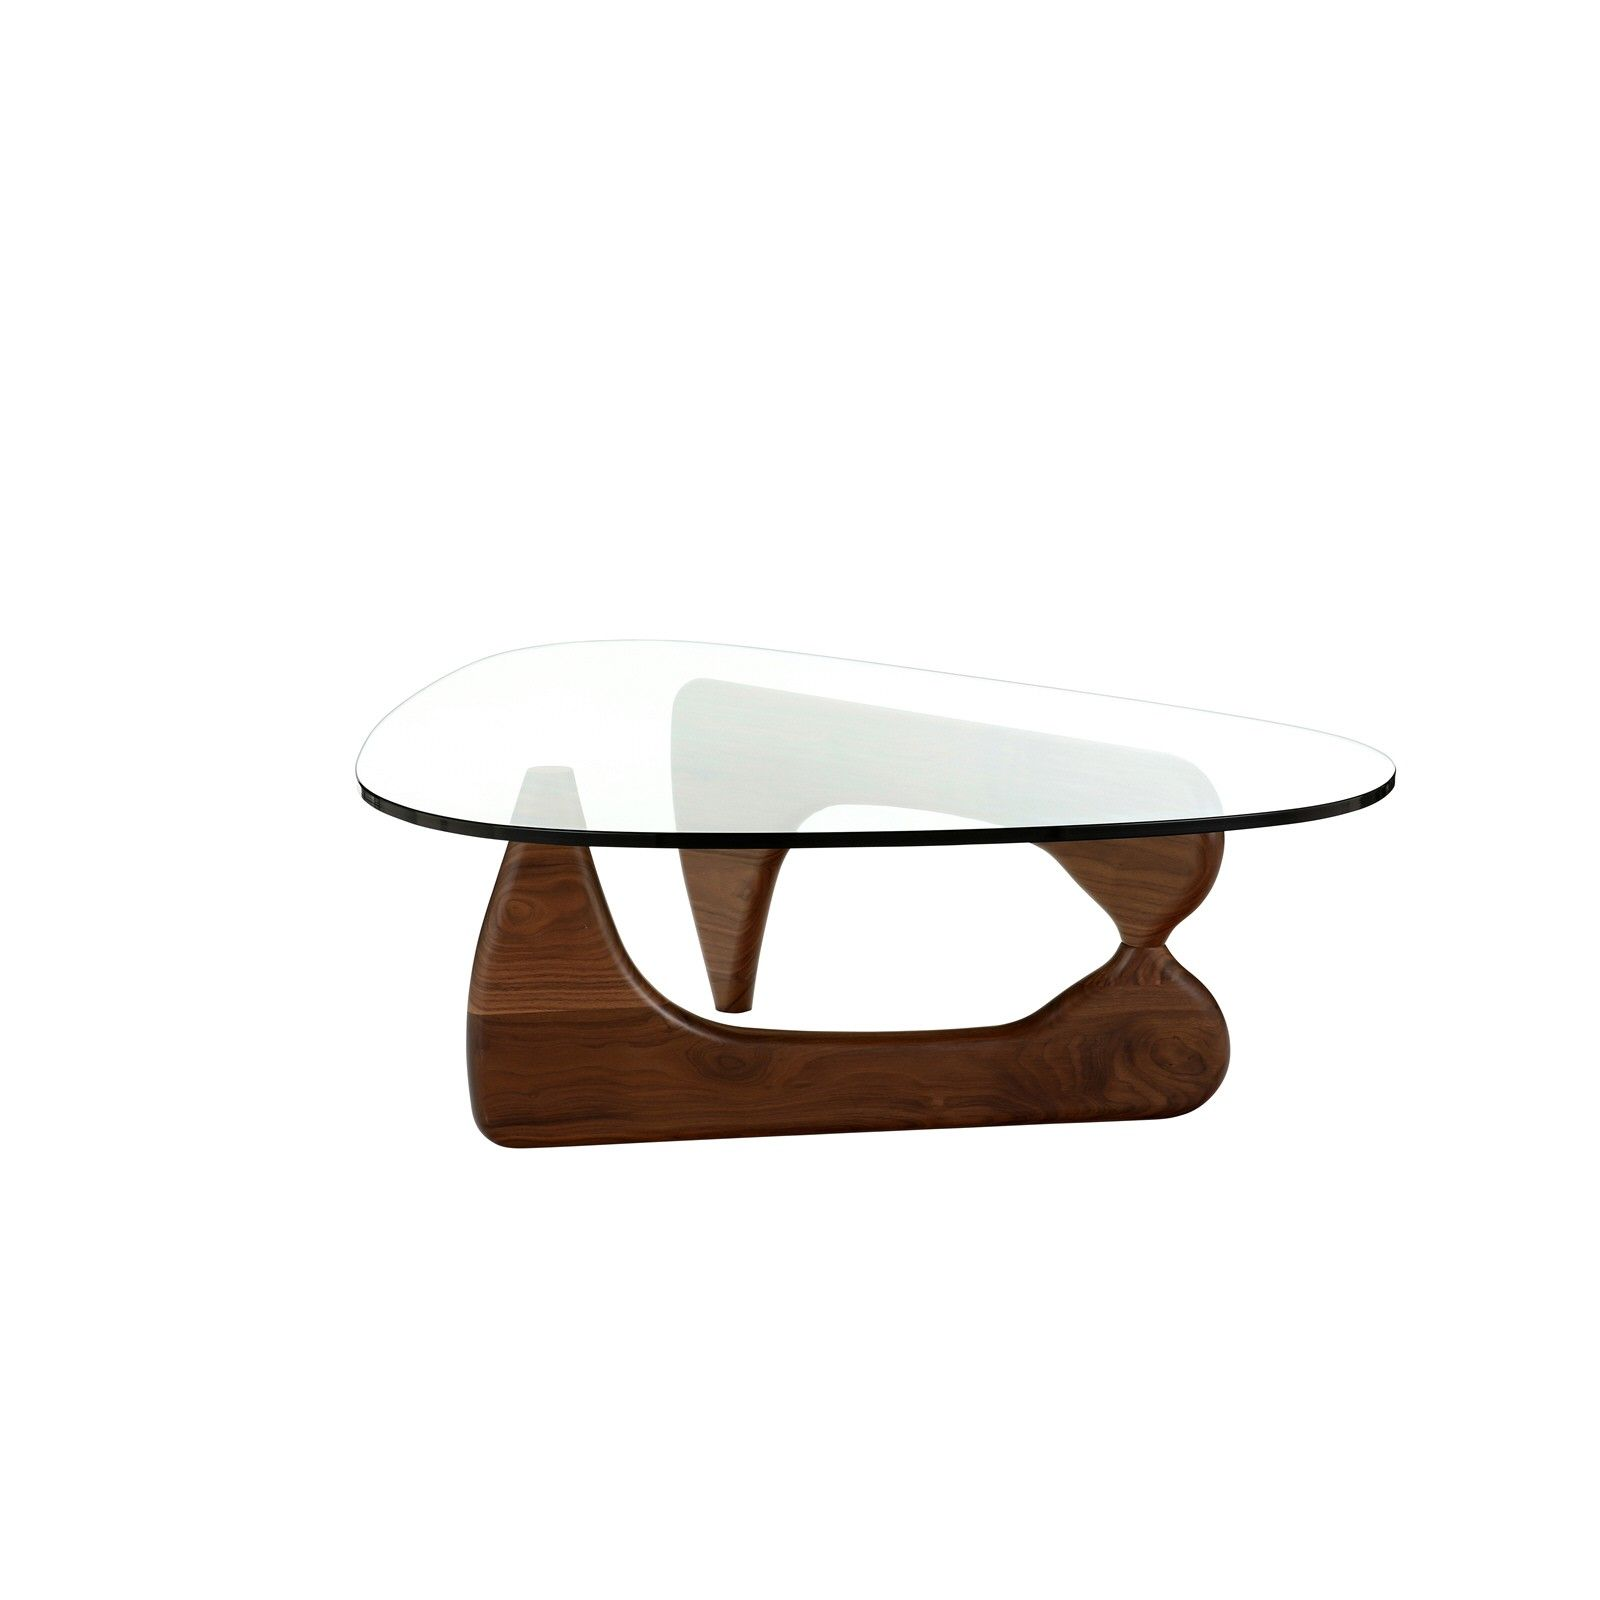 Replica Isamu Noguchi Coffee Table   Walnut | Coffee Tables | Nick Scali  Online Nick Scali